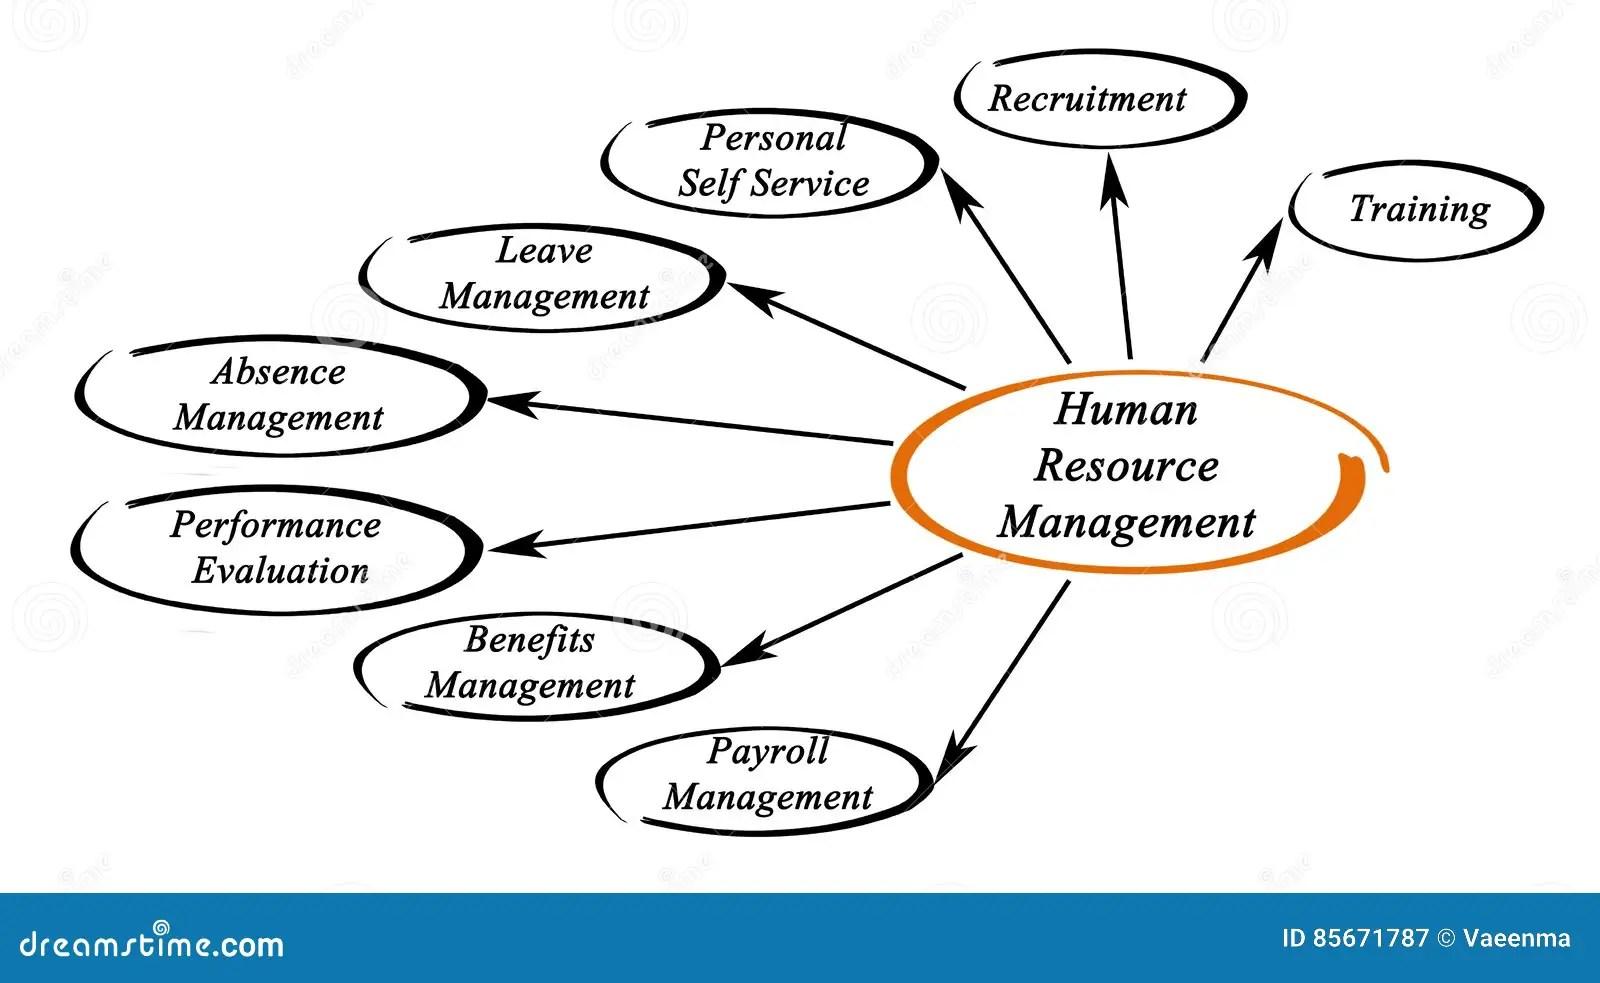 Human Resource Management stock illustration. Illustration